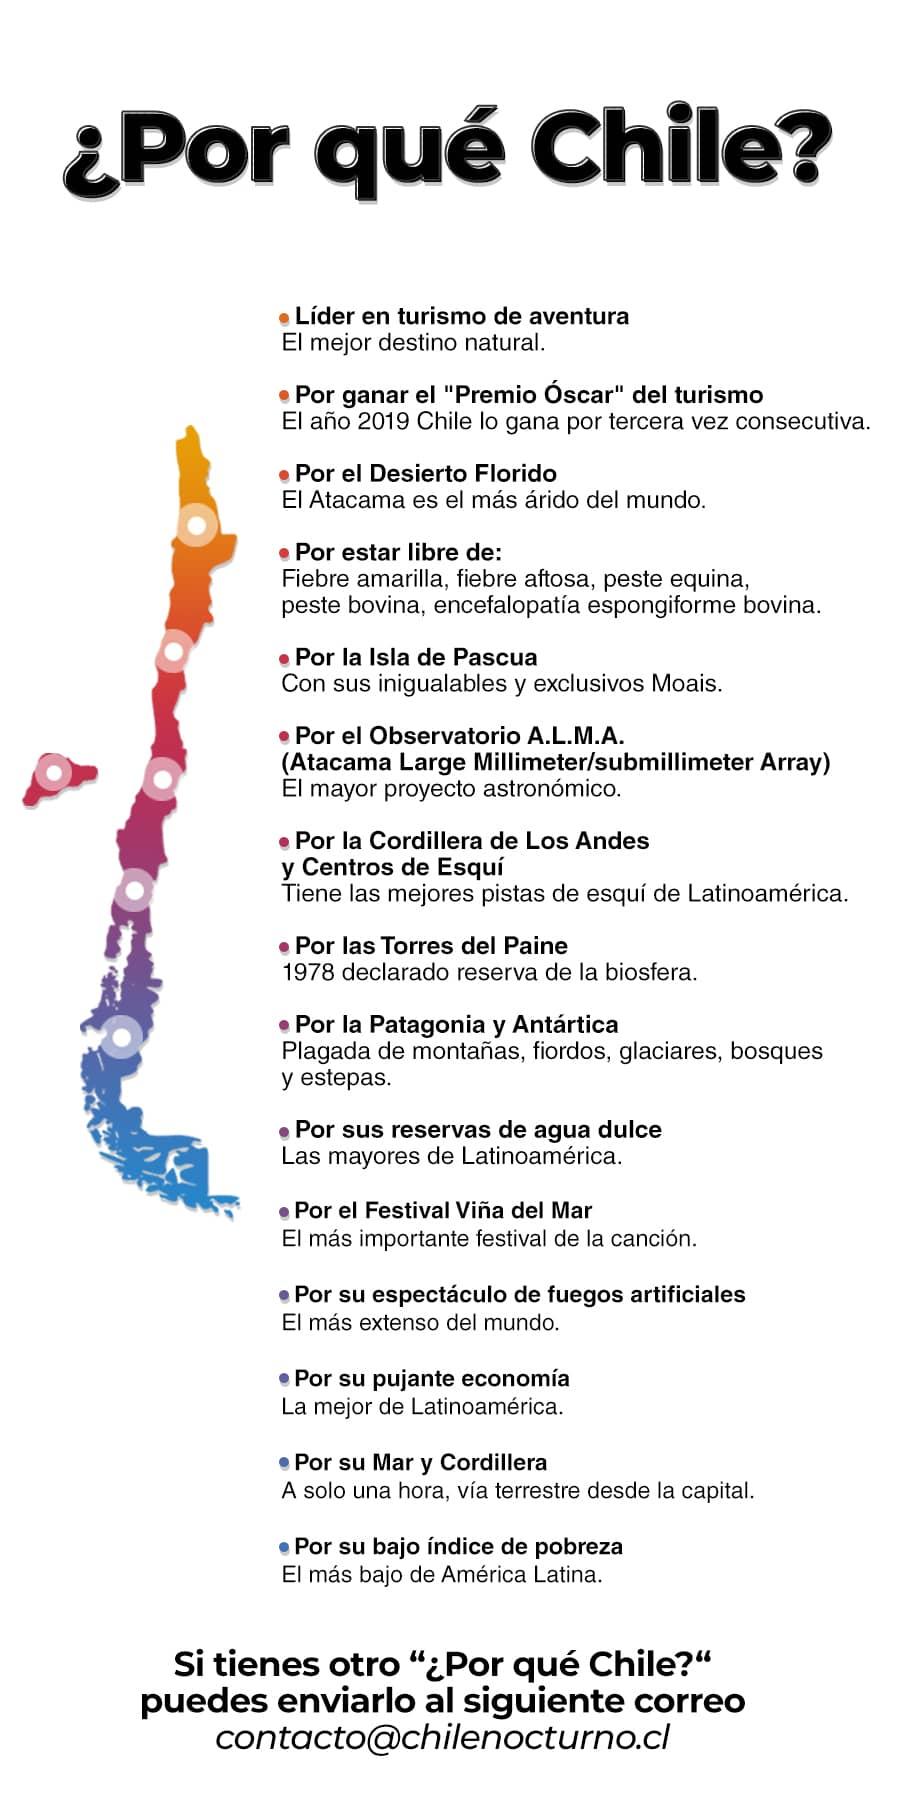 Despedida de Soltero - Chile Nocturno Por qué Chile 02